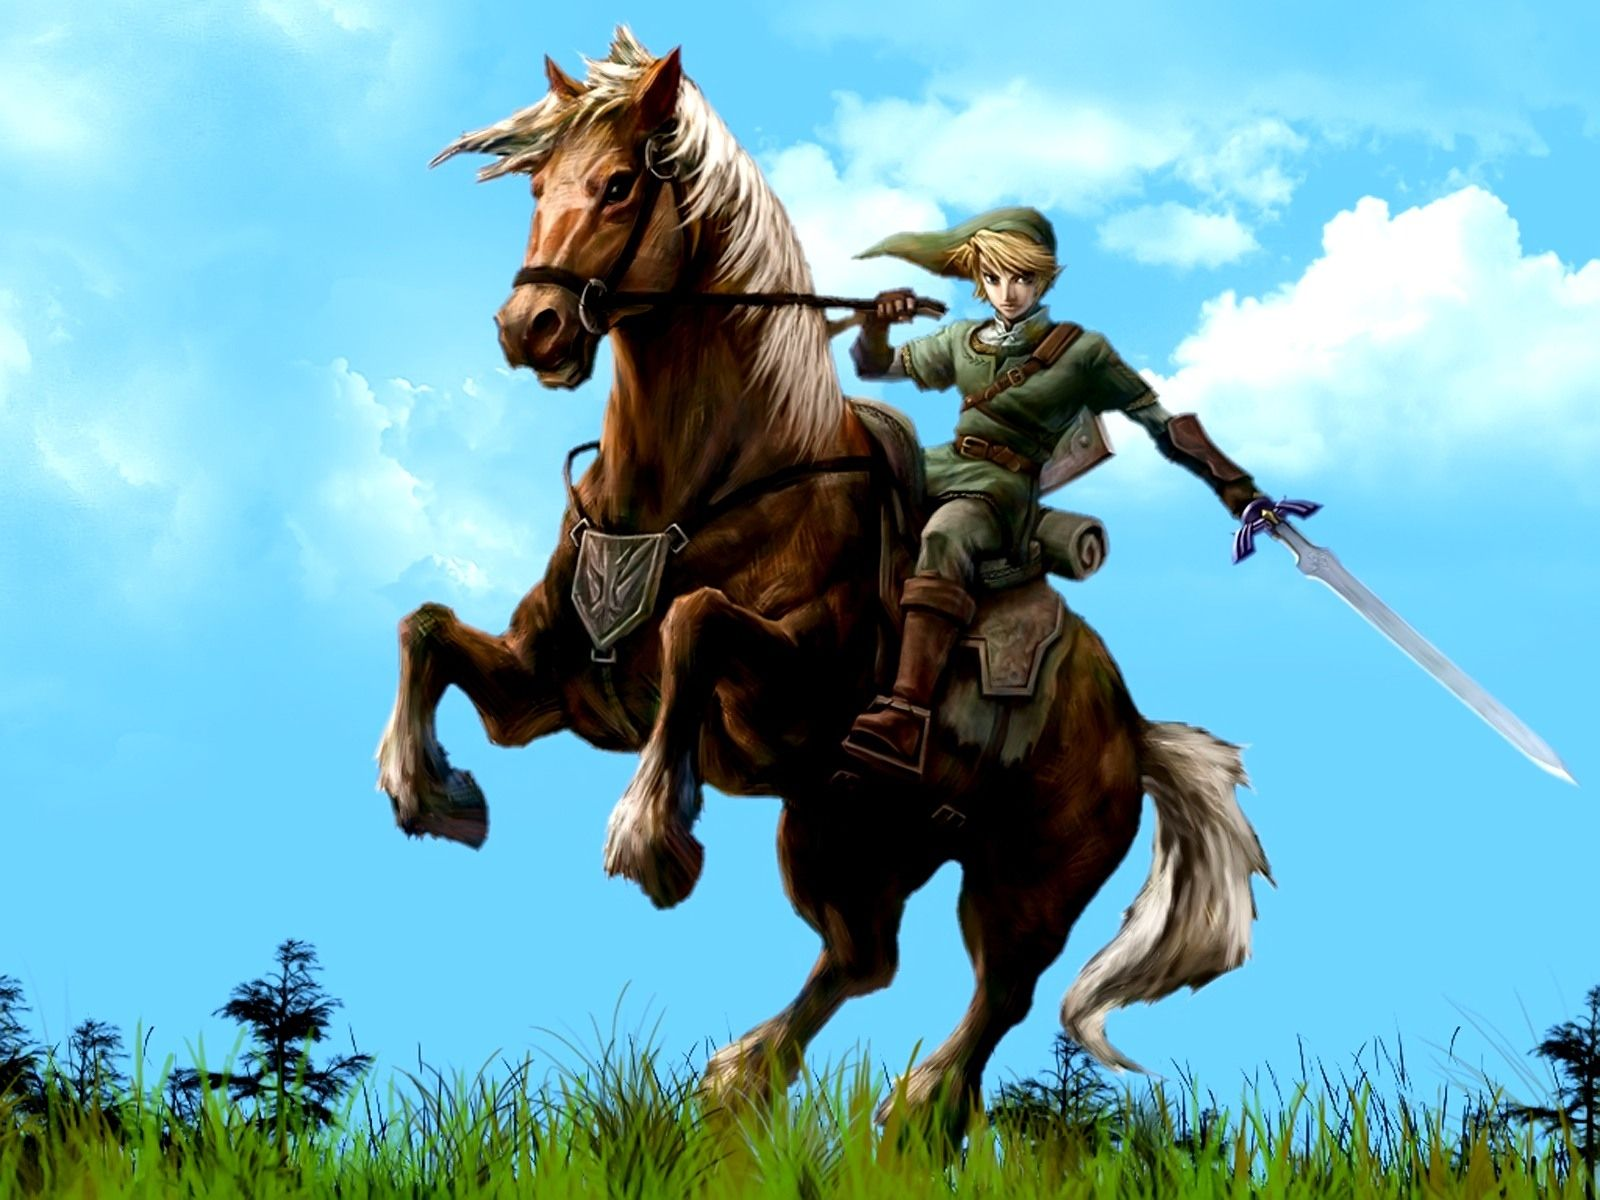 Link and Epona from The Legend of Zelda Legend of zelda